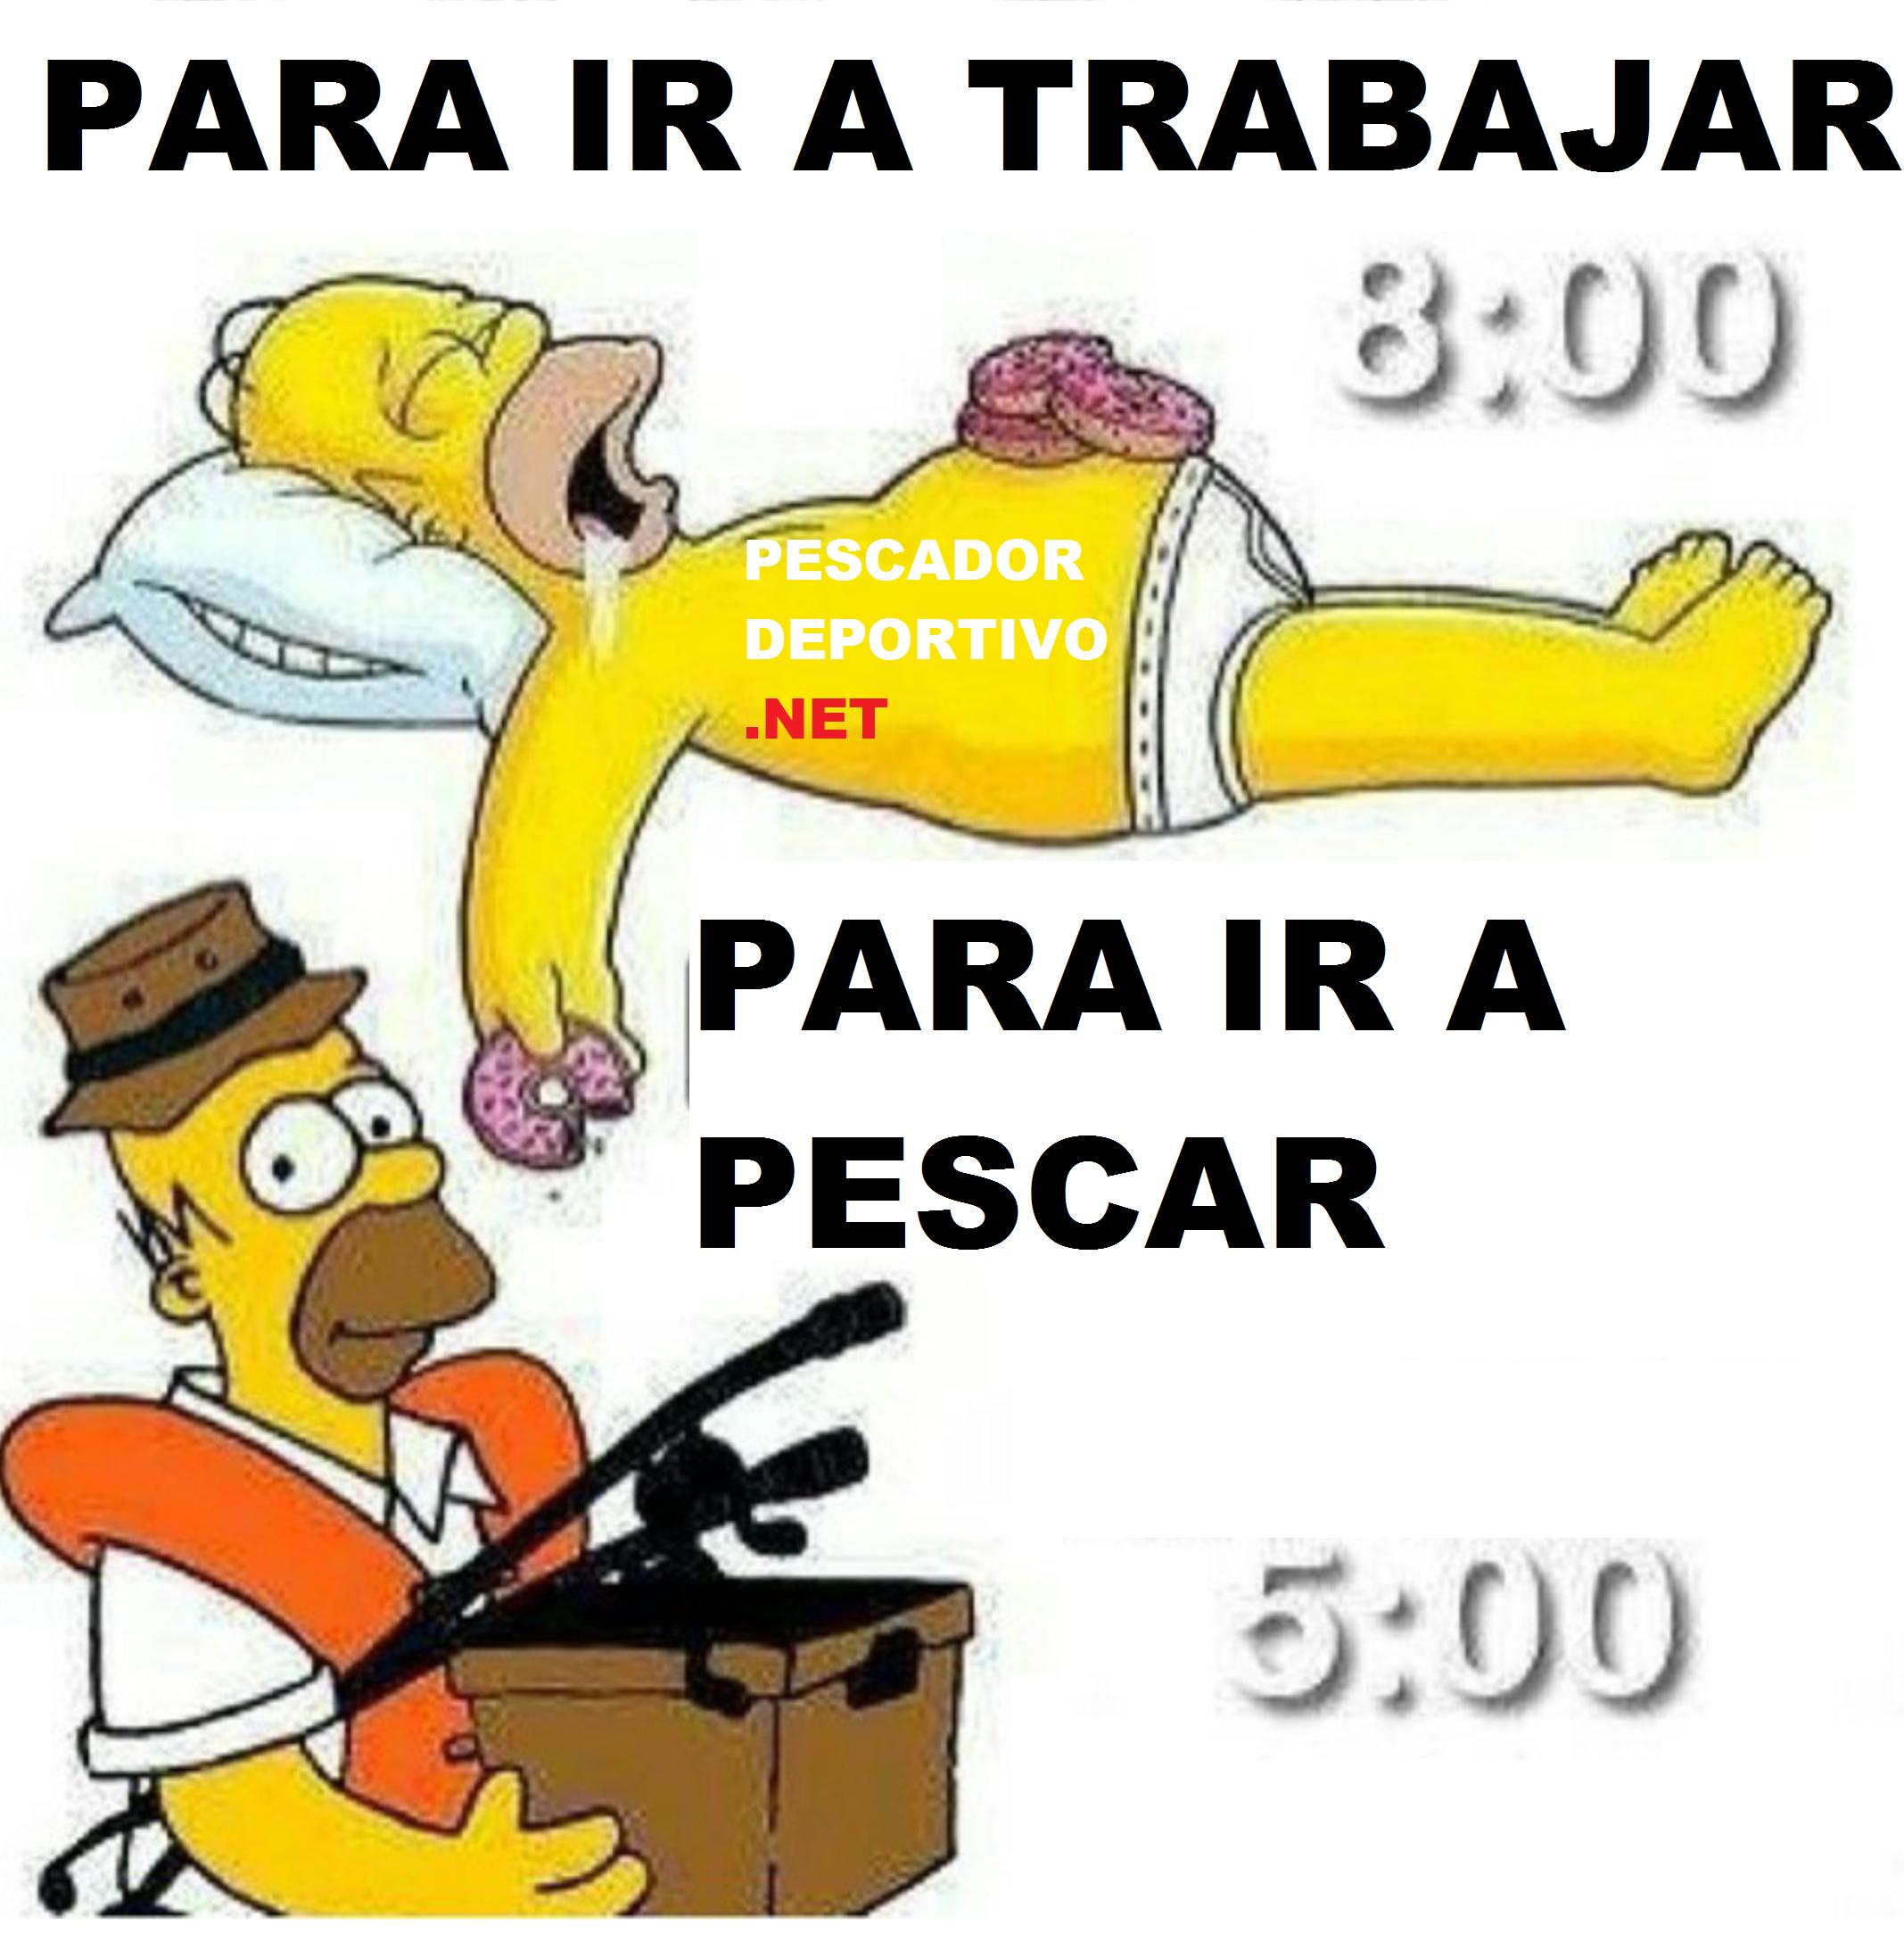 DORMIR PESCA HOMERO